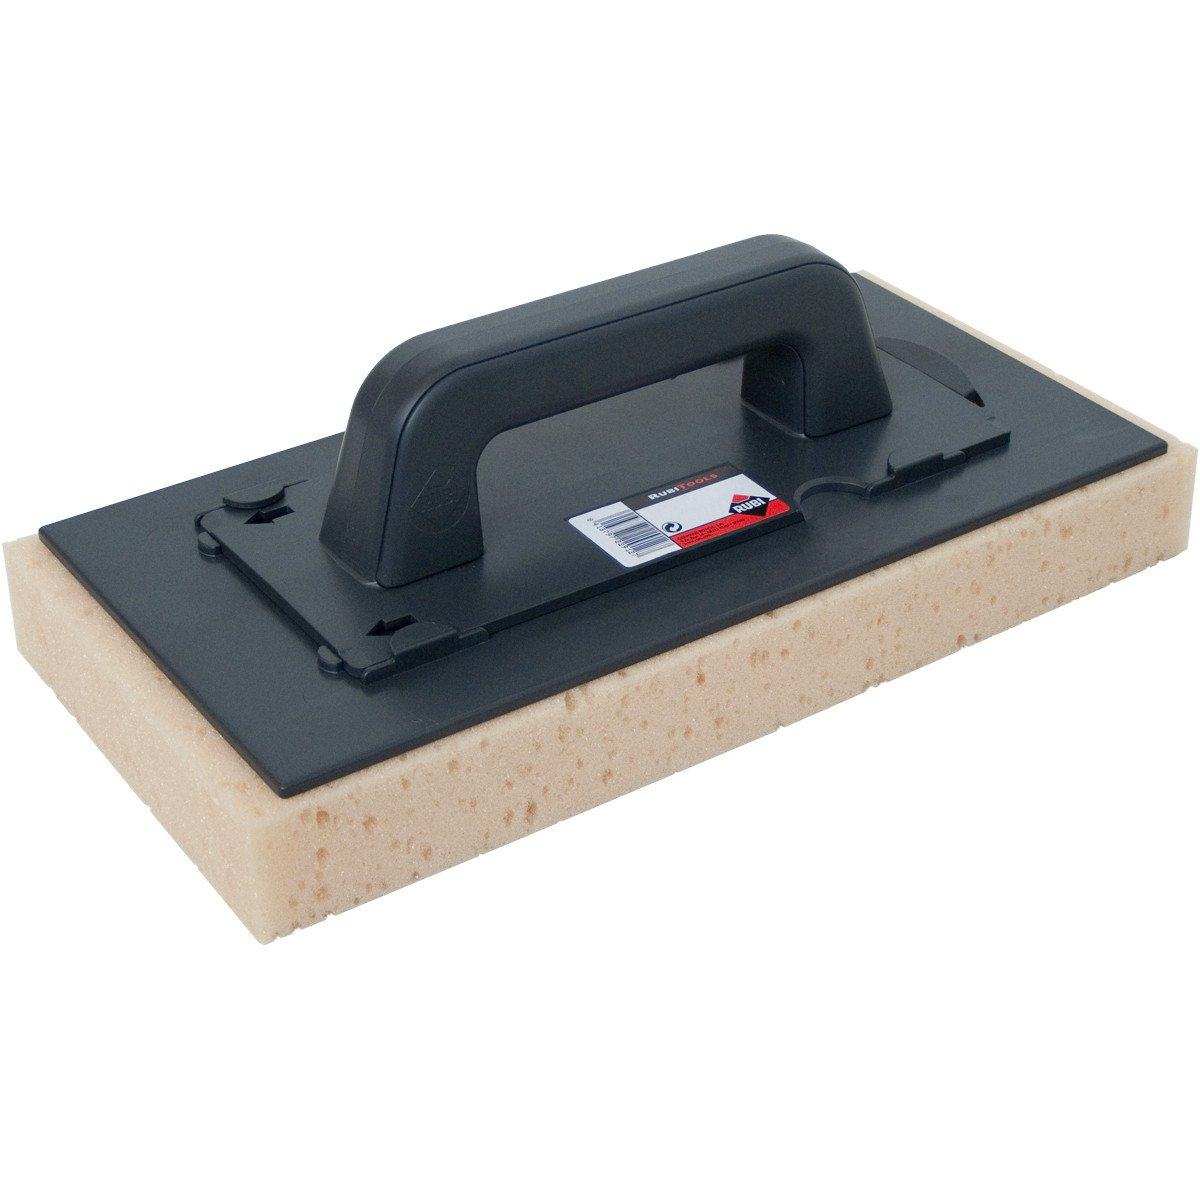 Rubi Tools Rubiclean Triple Wash Bucket Includes 1 Interchangeable Sponge With Handle by Rubi Tools (Image #4)